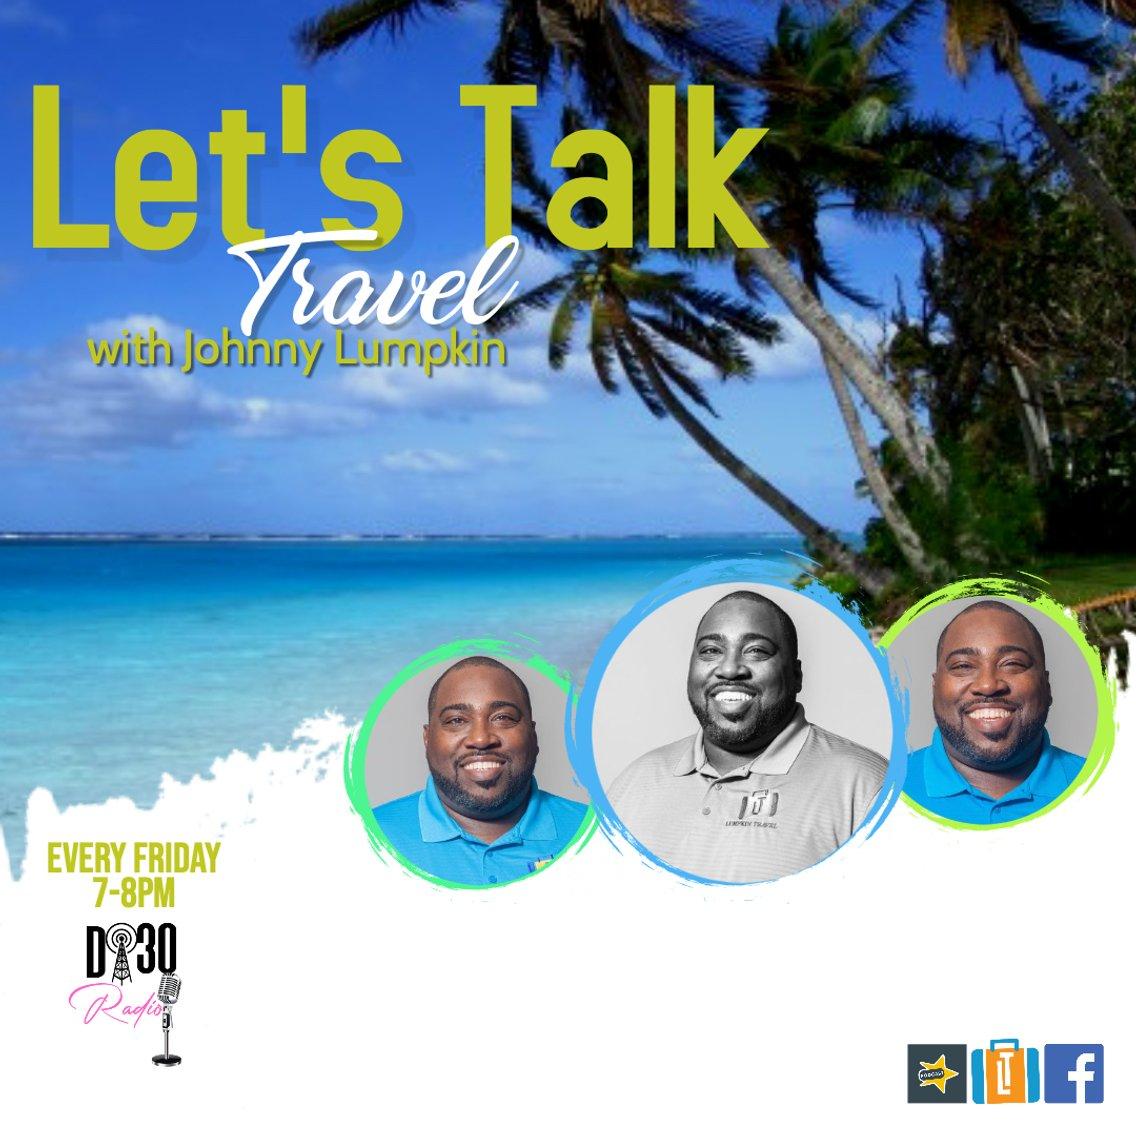 Let's Talk Travel - immagine di copertina